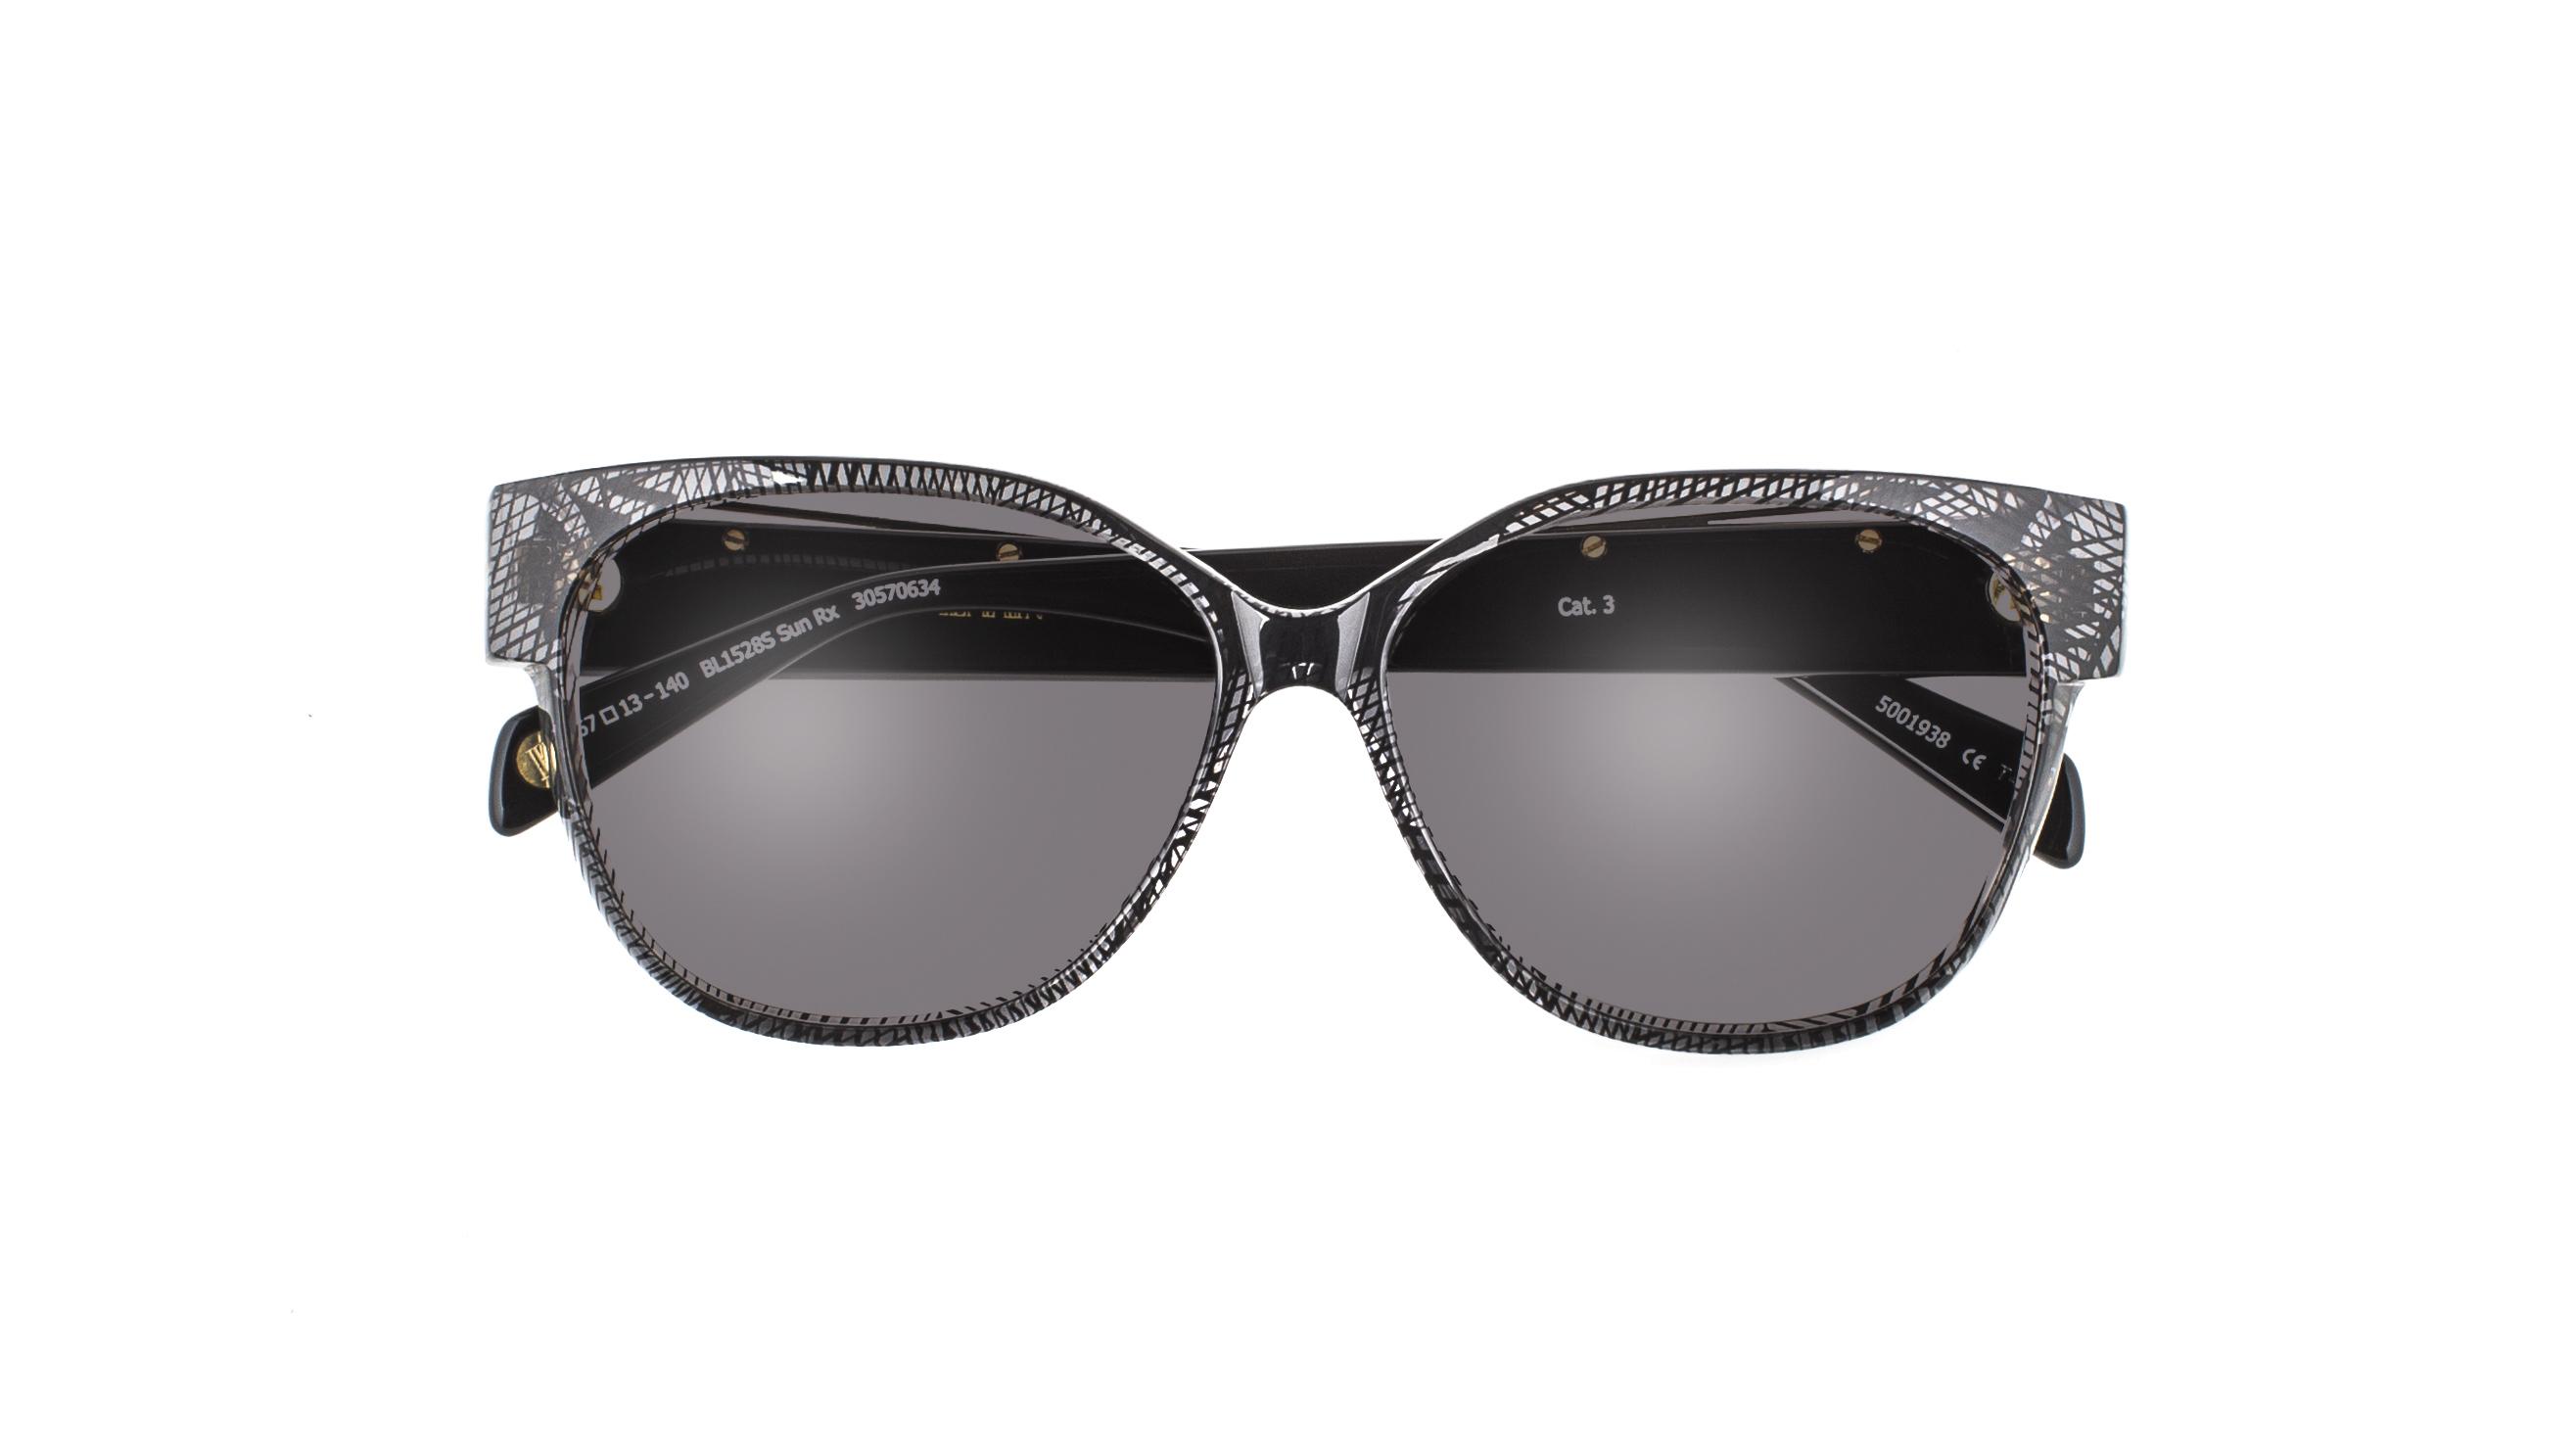 Balmain x Specsavers BL15015 SUN RX 30686915 - RRP 2 pairs single vision $459